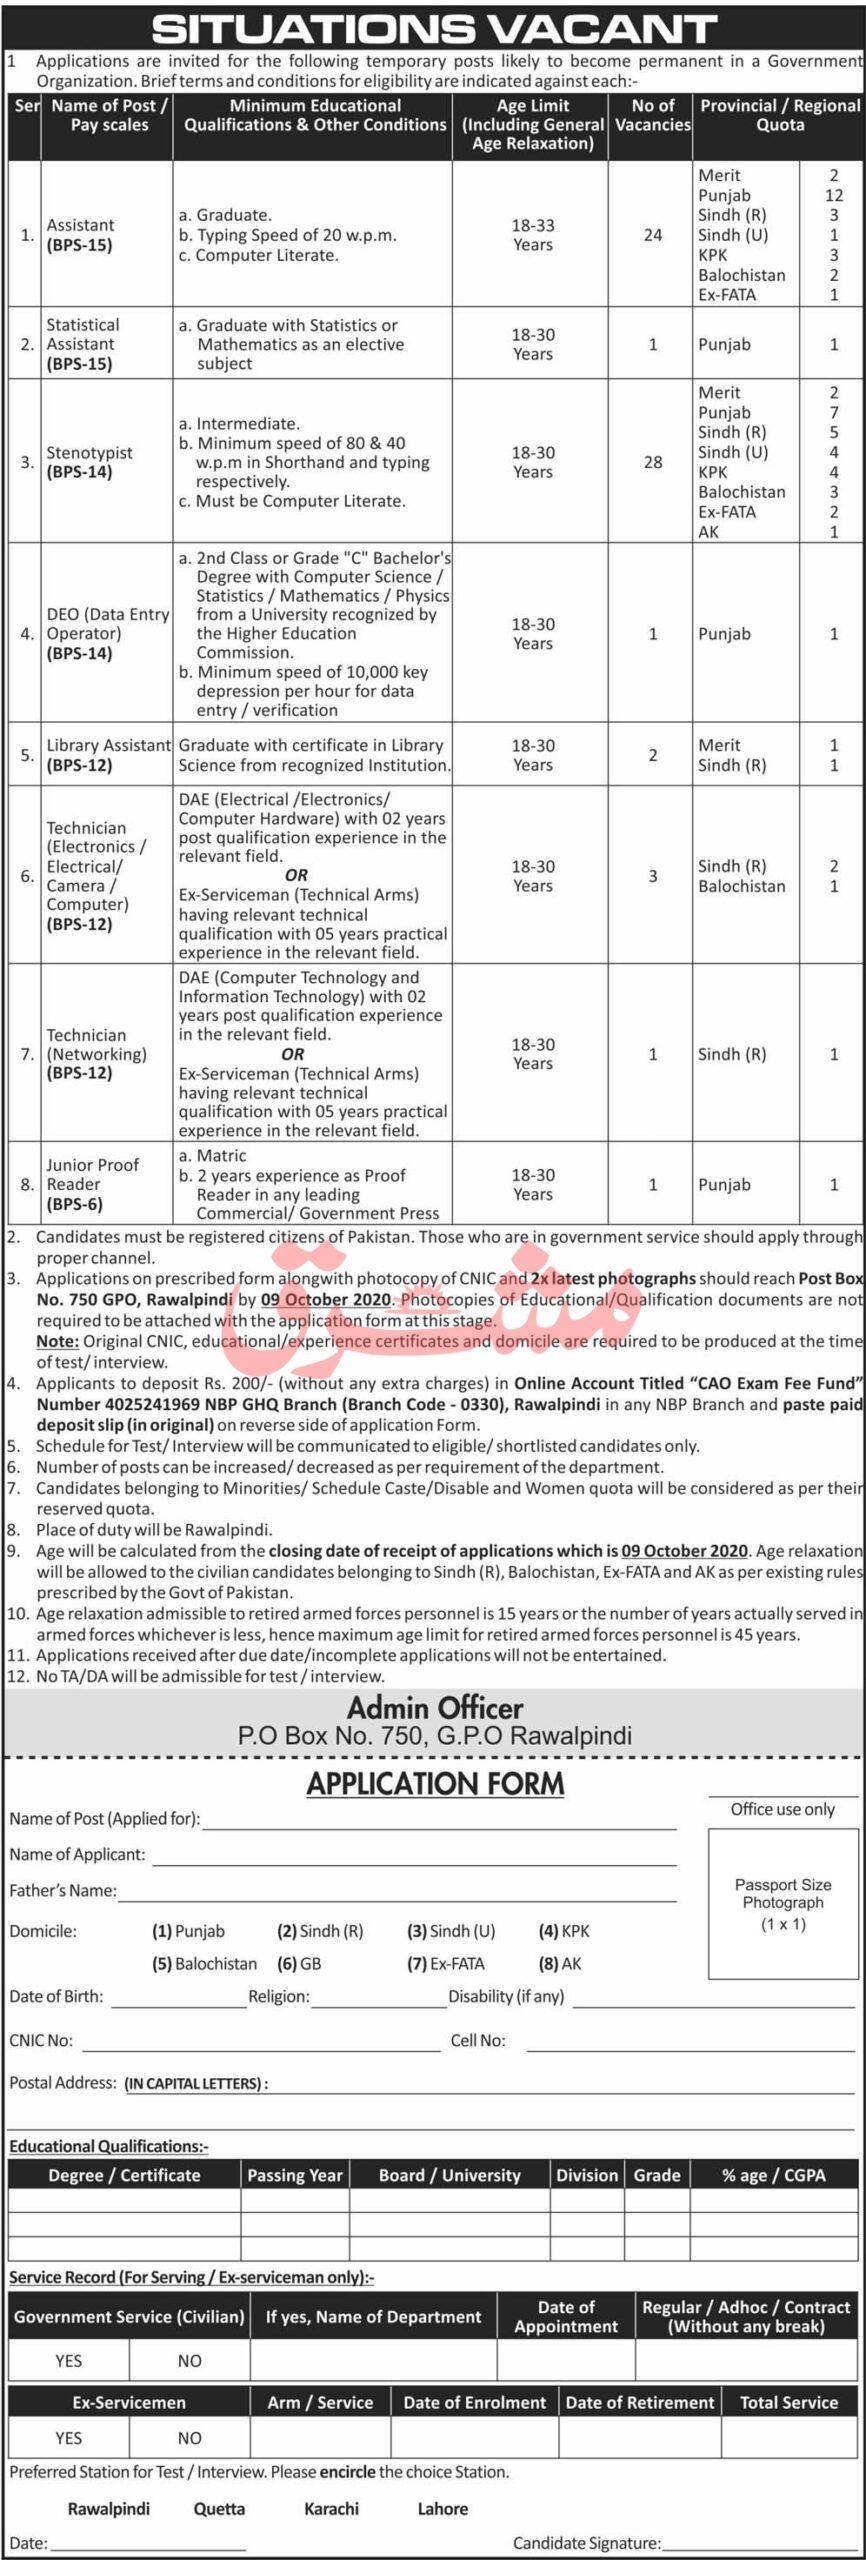 PO Box 750 GPO Rawalpindi Jobs September 2020